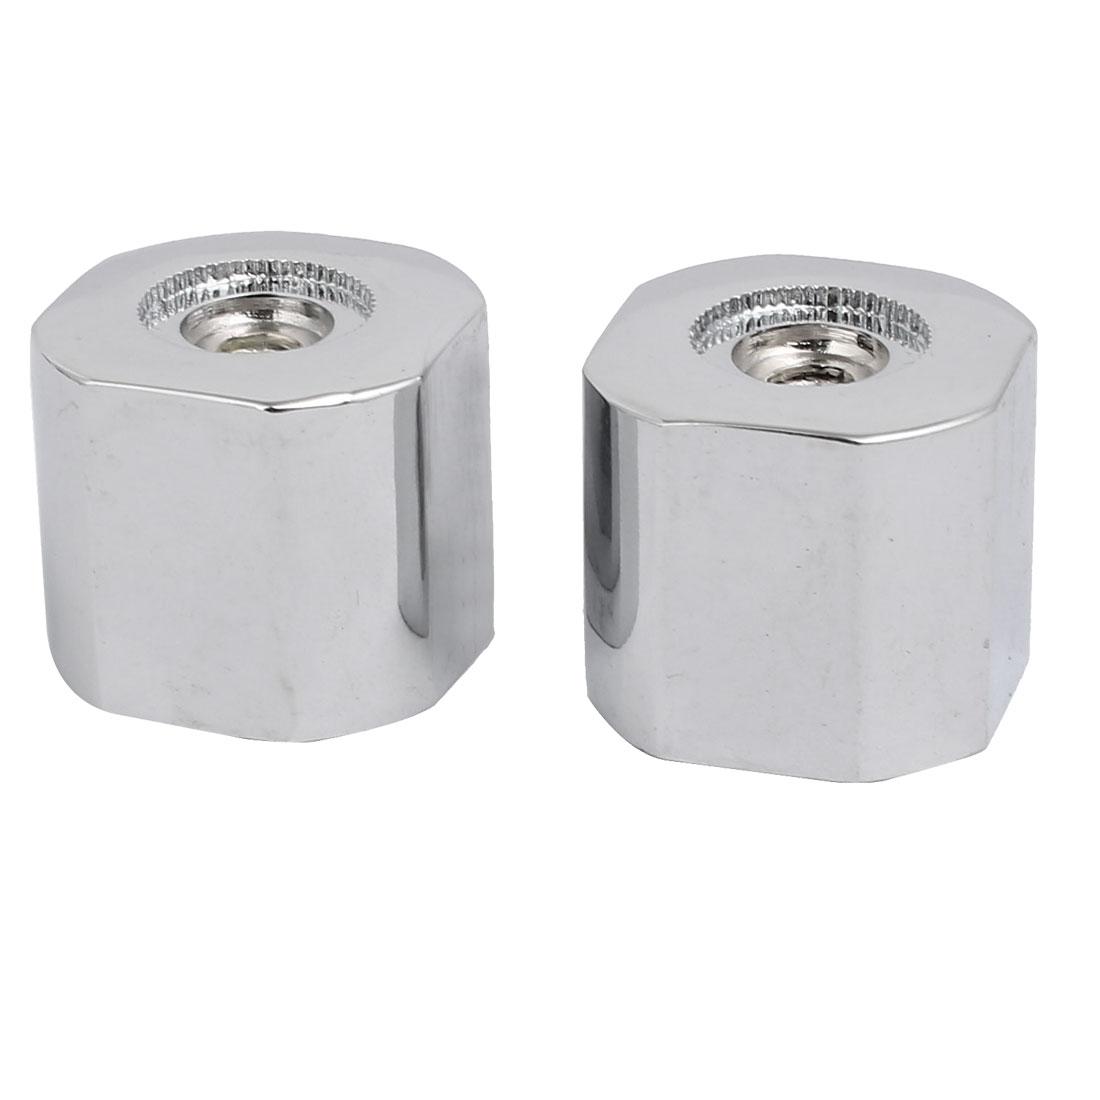 2pcs 28mmx25mm Zinc Alloy Faucet Water Tap Handle Grip Silver Tone